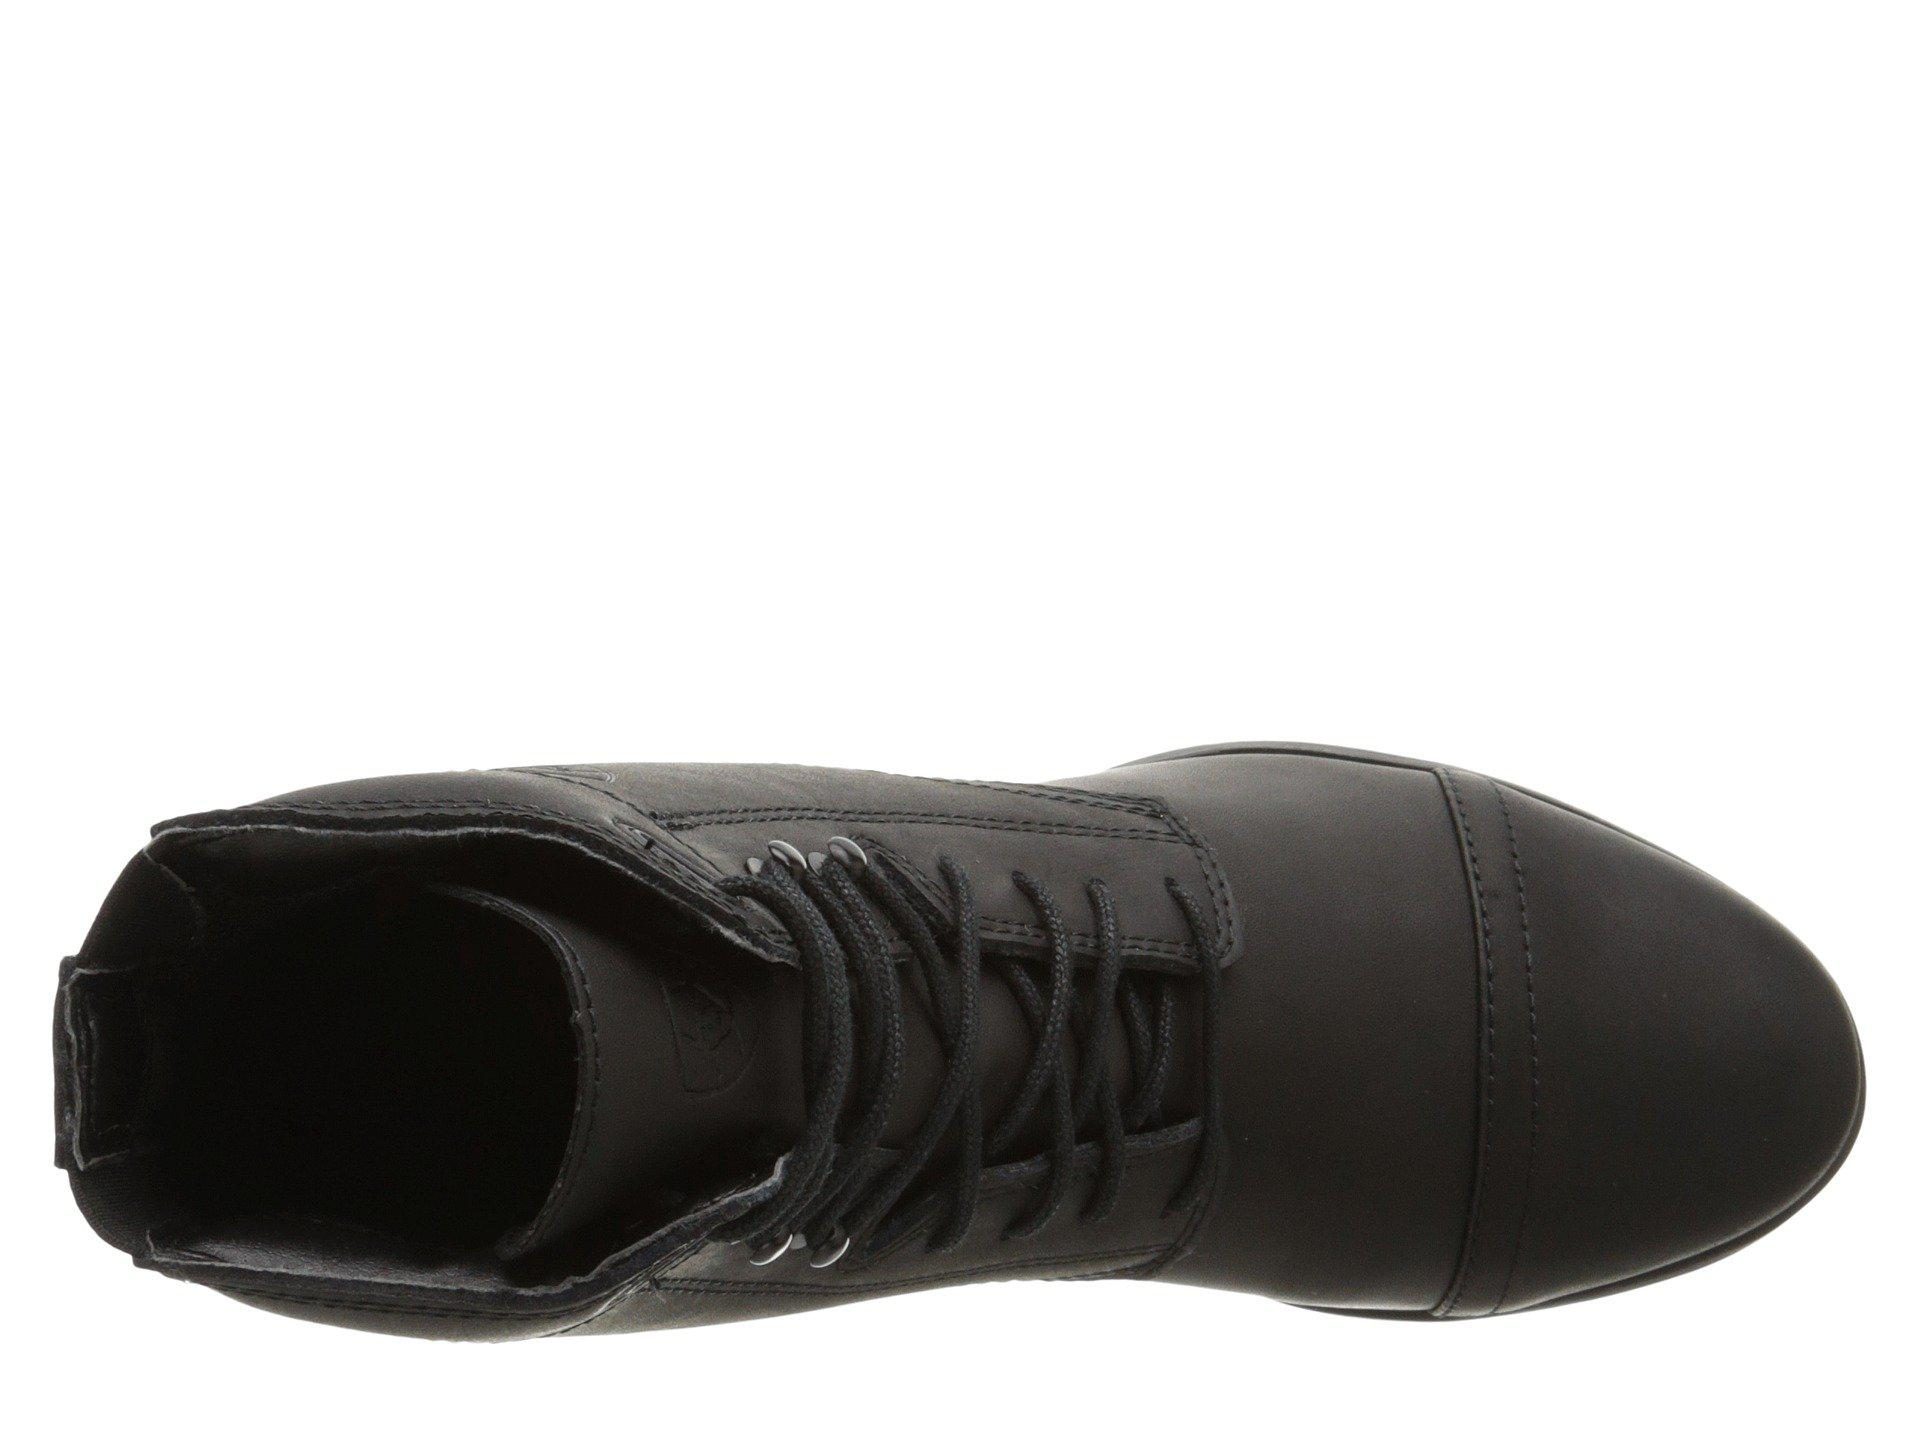 c3446b35421563 Ariat - Scout Paddock (black) Women s Boots - Lyst. View fullscreen